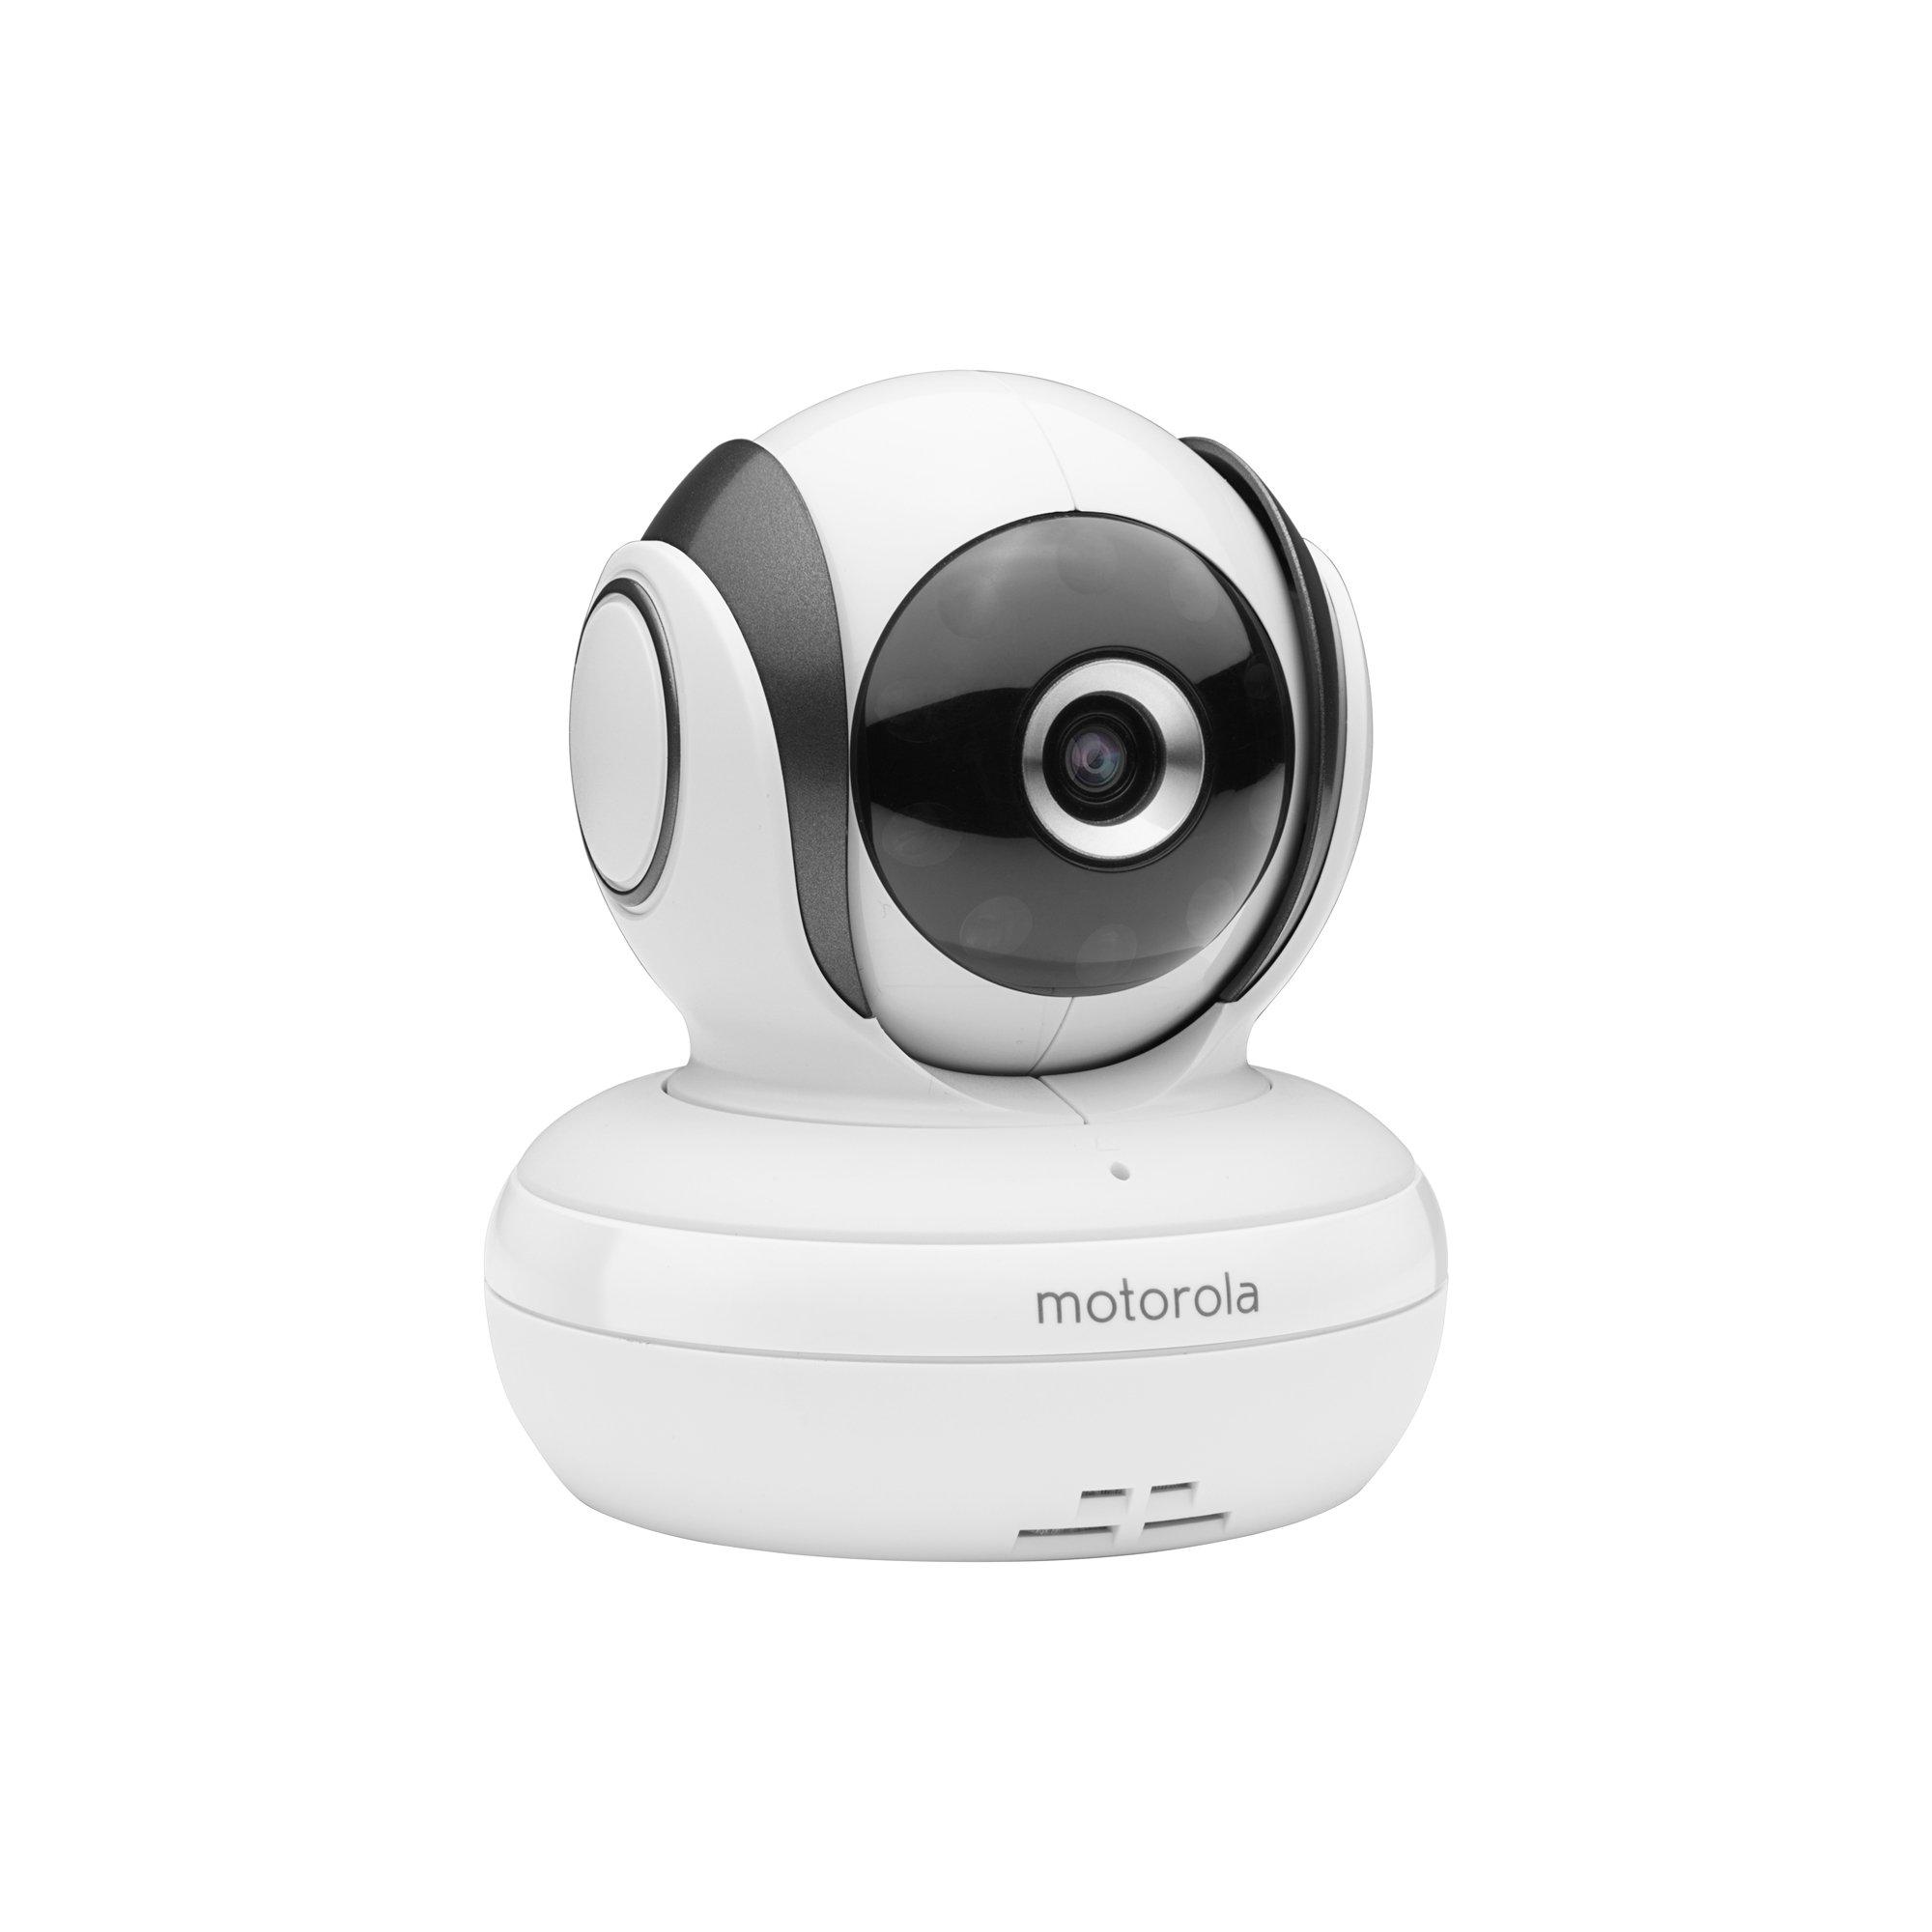 Motorola Additional Camera for Motorola MBP33S and MBP36S Baby Monitors (MBP36SBU) by Motorola (Image #3)